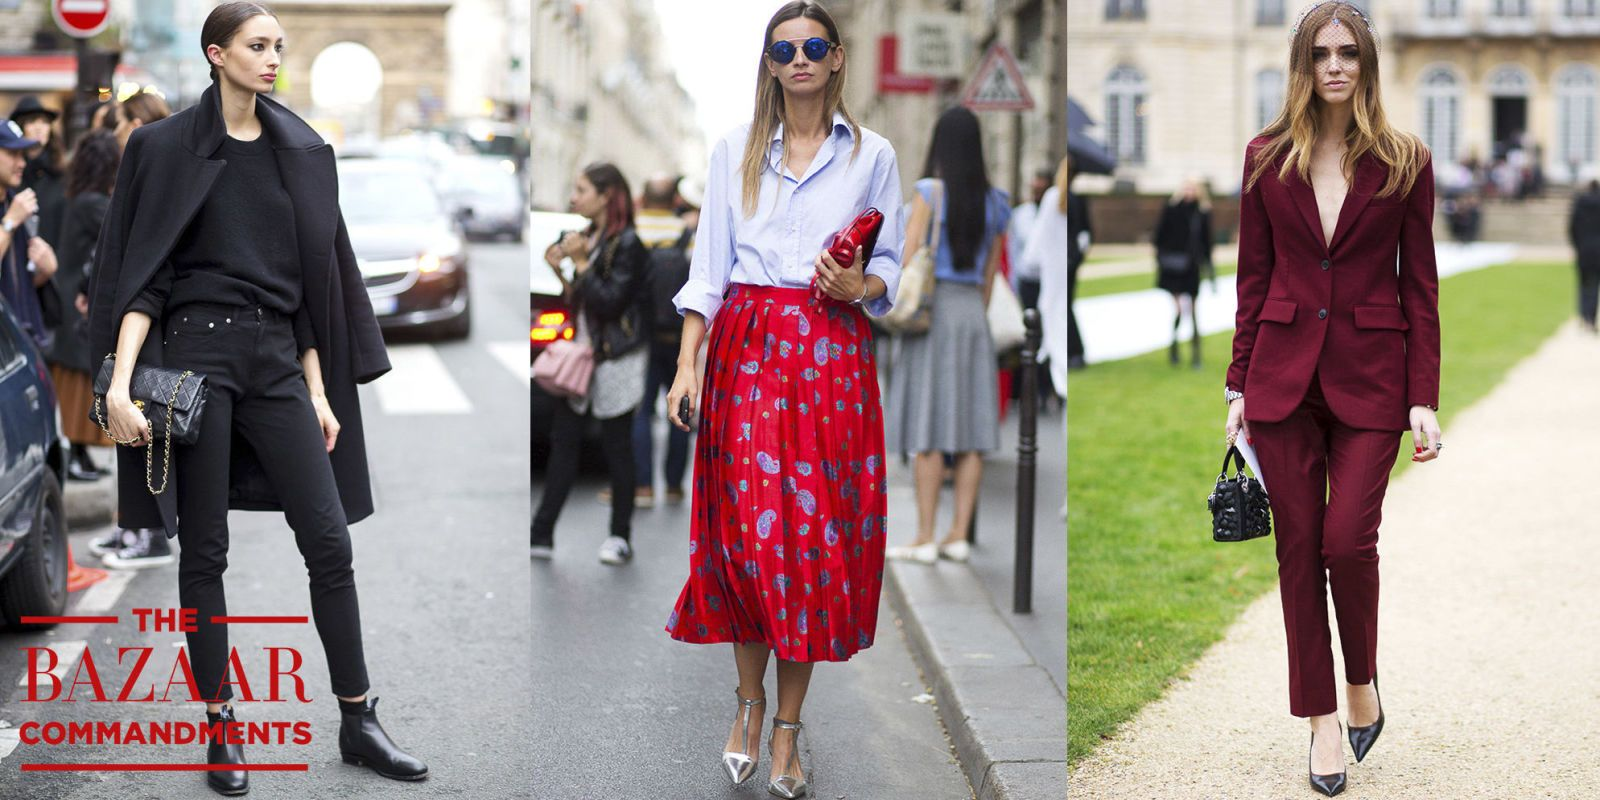 The BAZAAR Commandments: Dressing for a Fashion Job